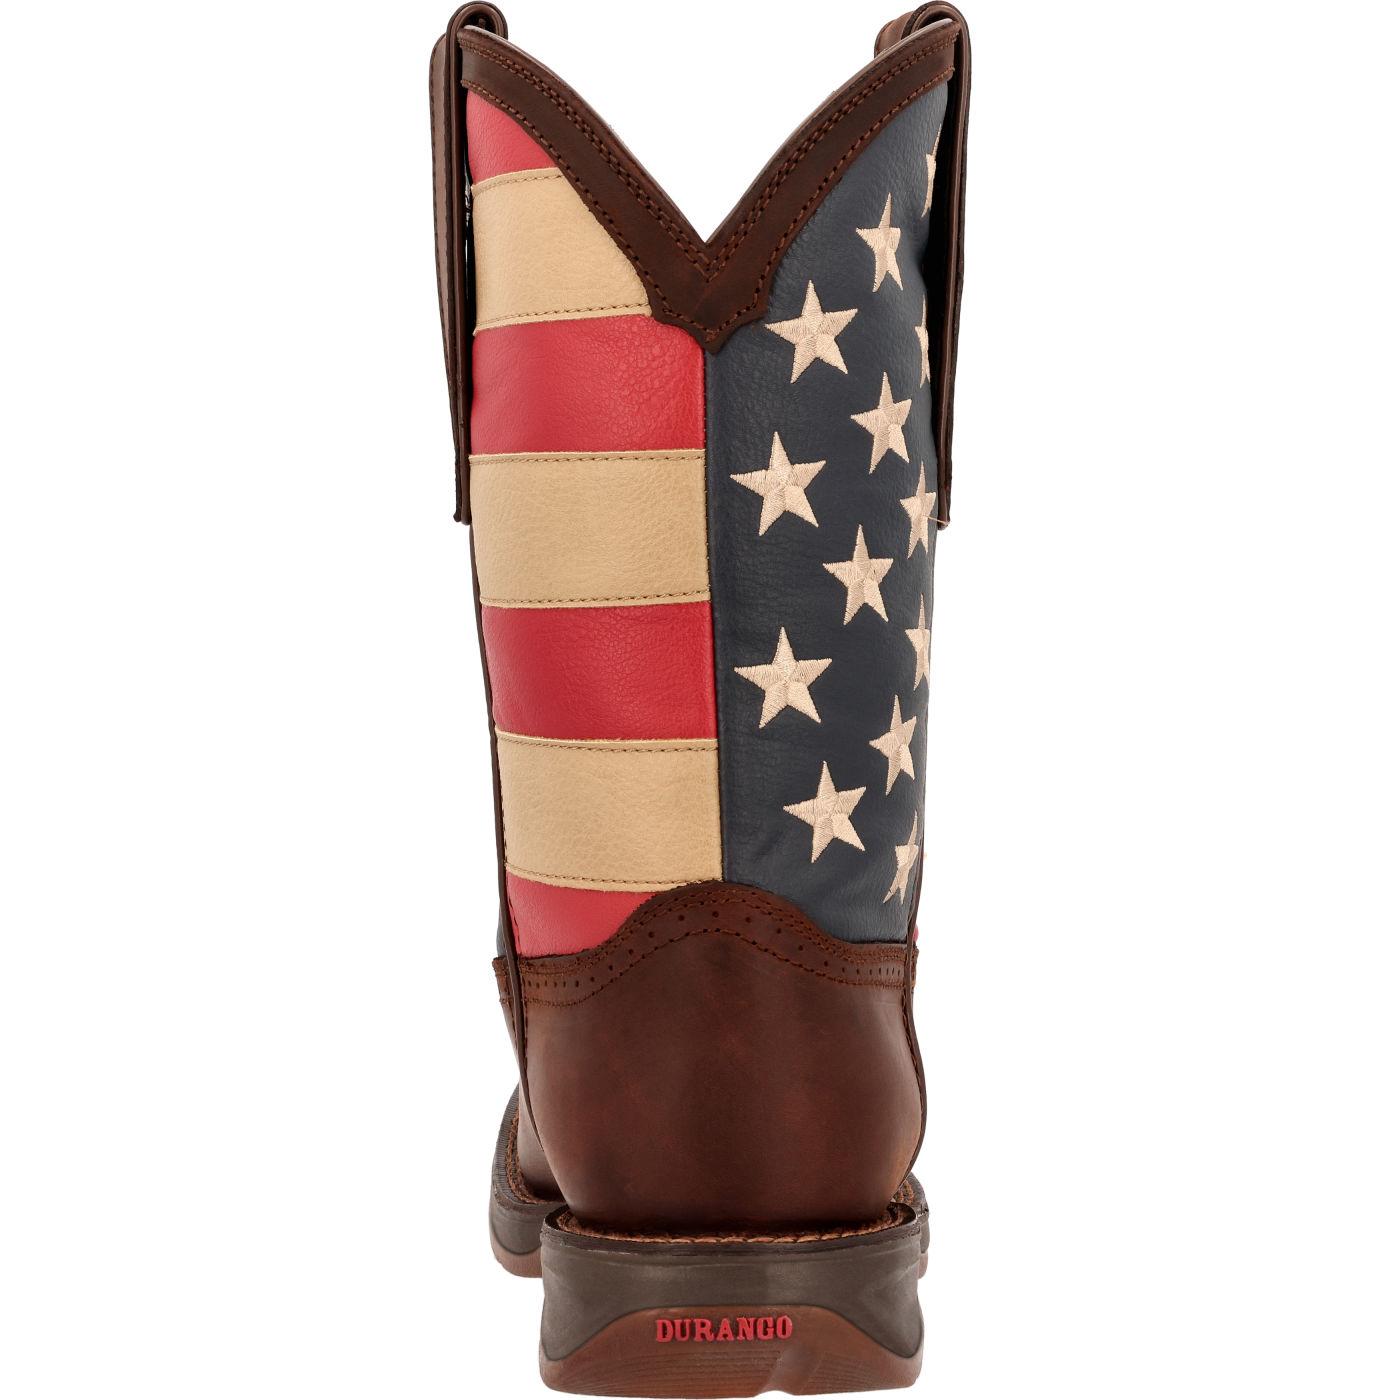 d76bcdb1e8e American Flag Boots - Rebel by Durango Men s Flag Western Boots  DB5554